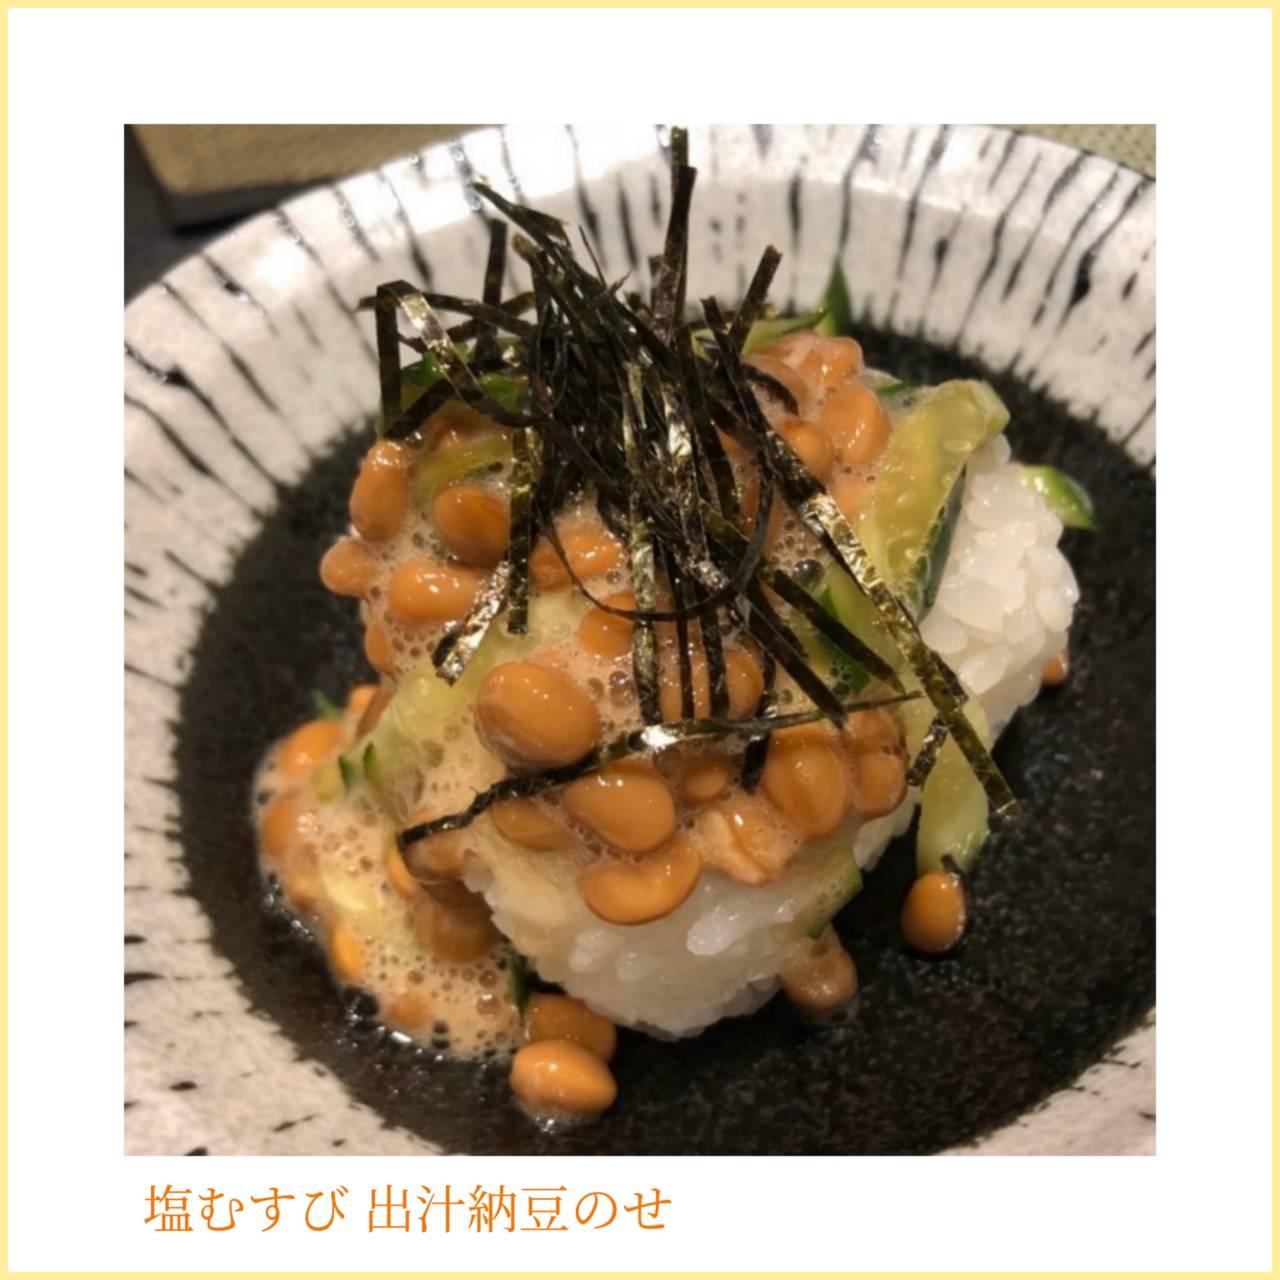 05_l_menu_item